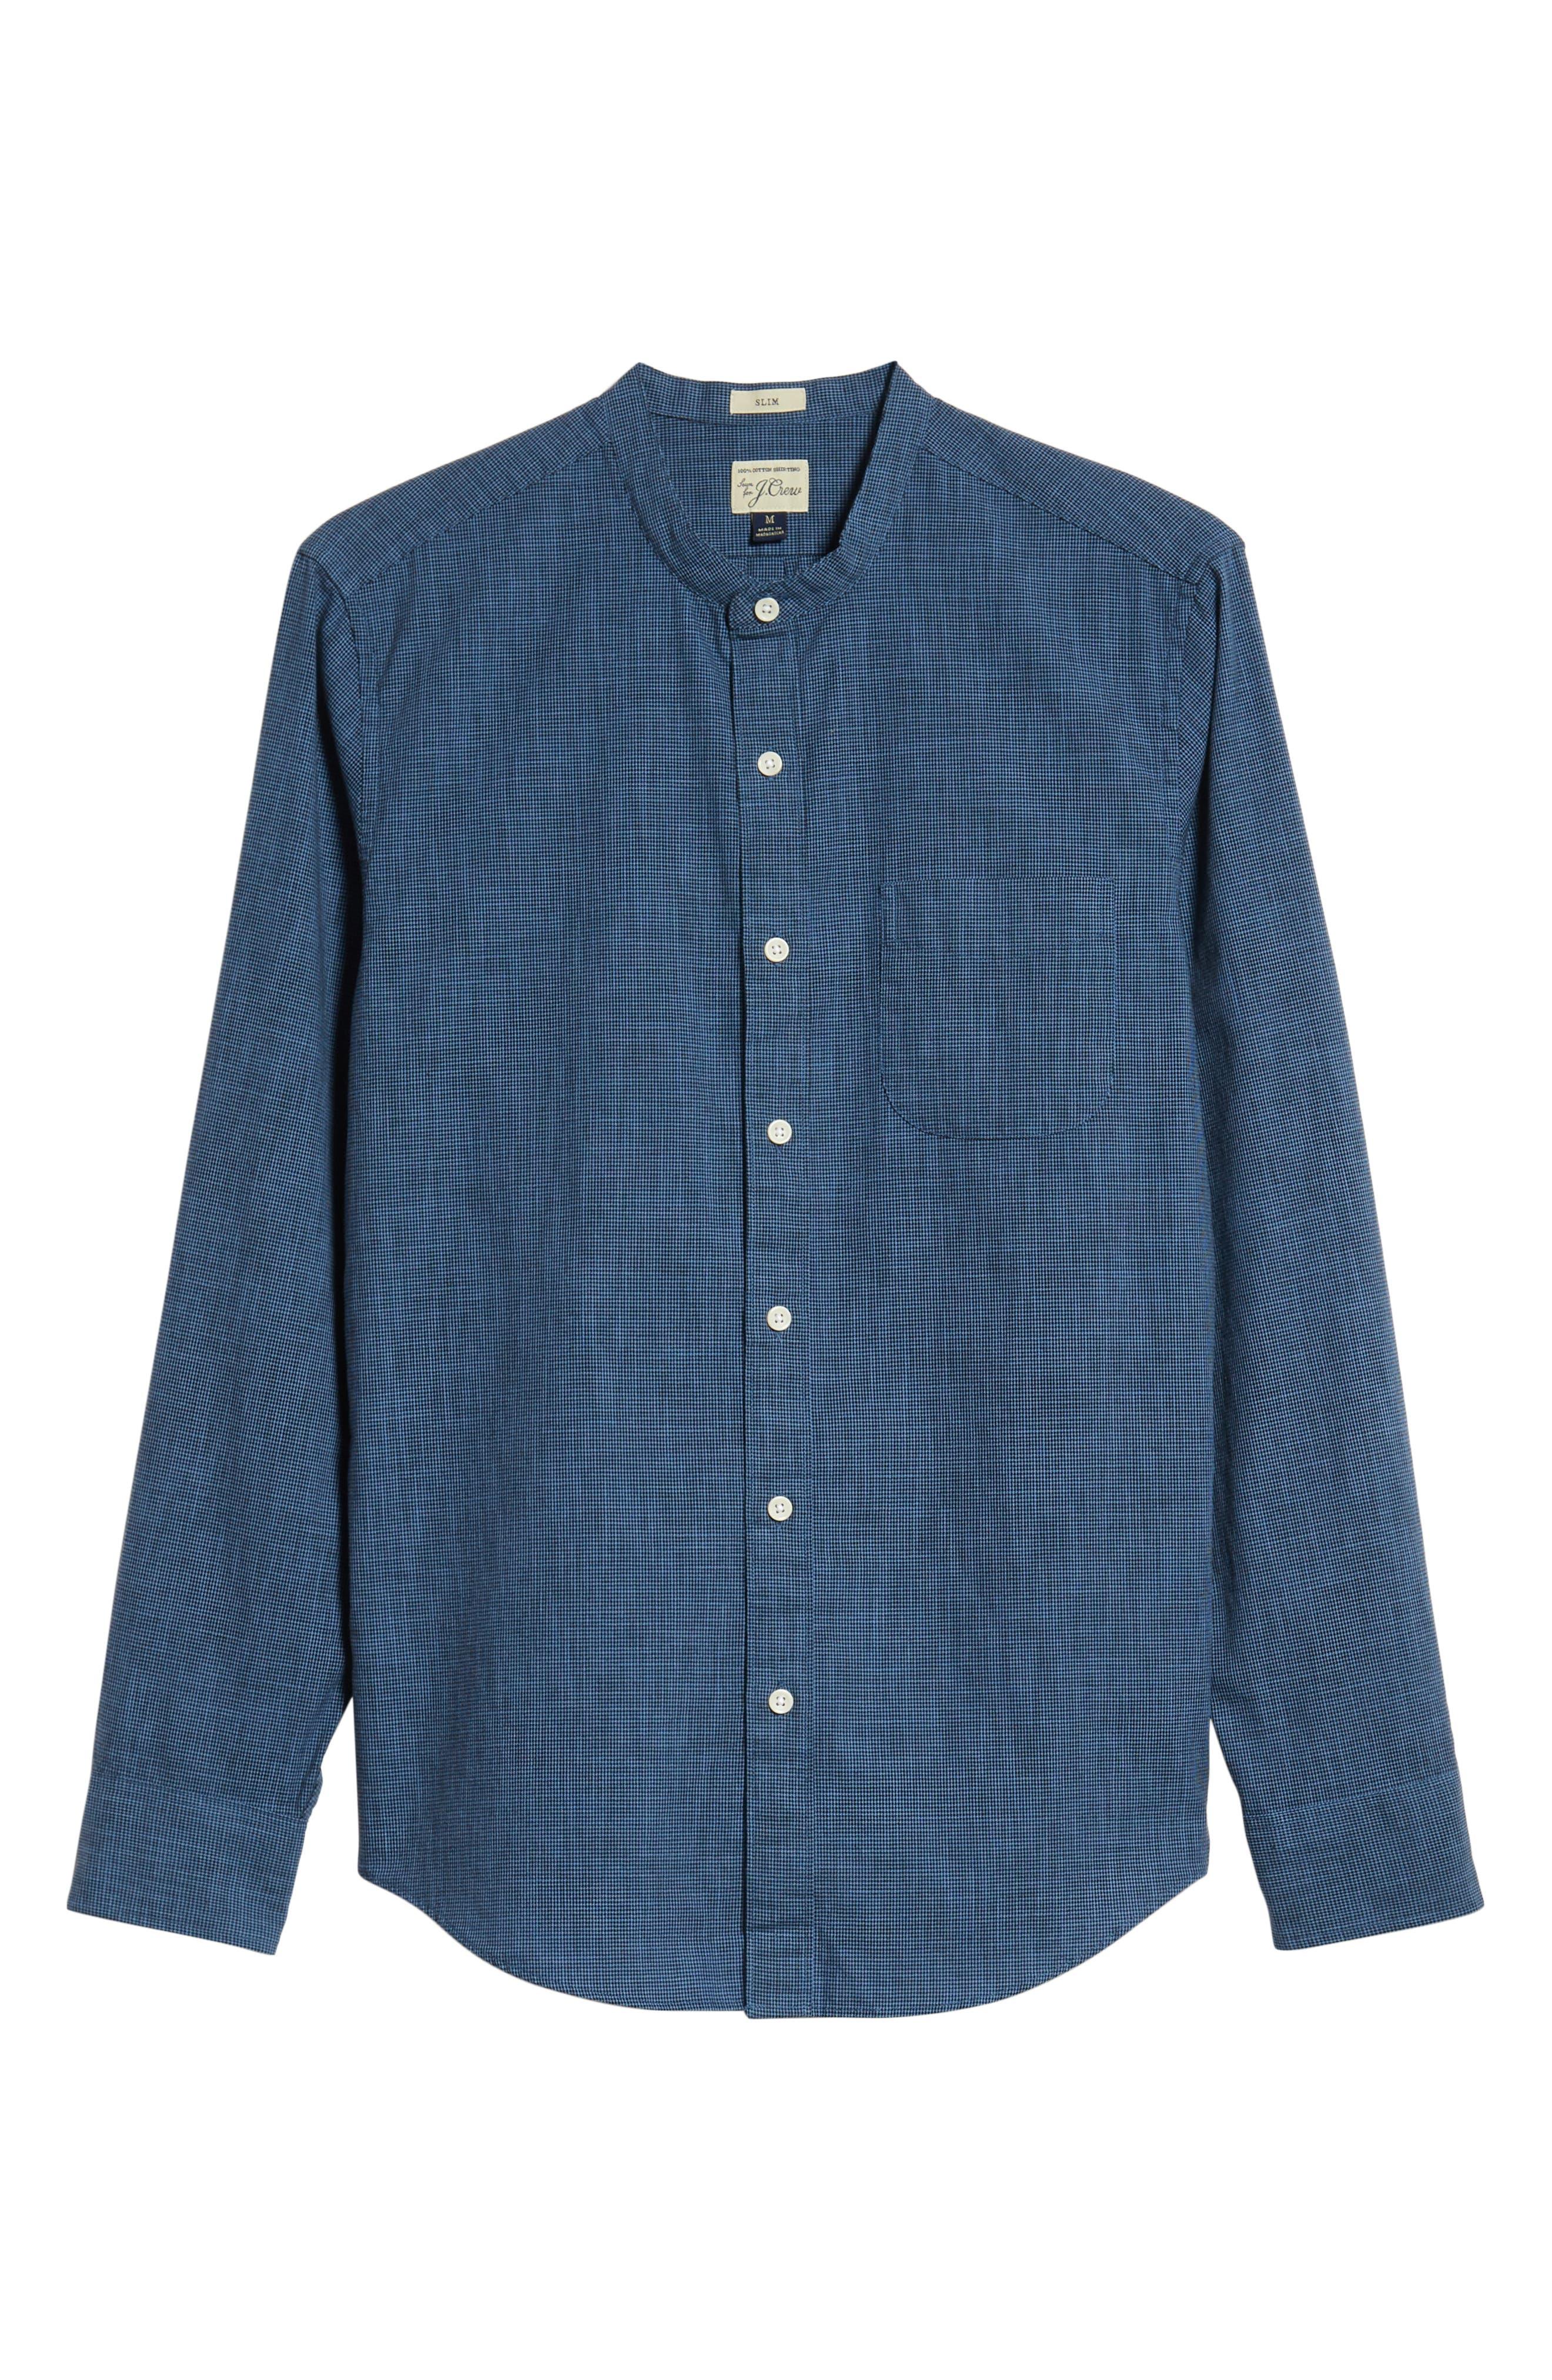 Slim Fit Band Collar Shirt,                             Alternate thumbnail 6, color,                             Dark Evening